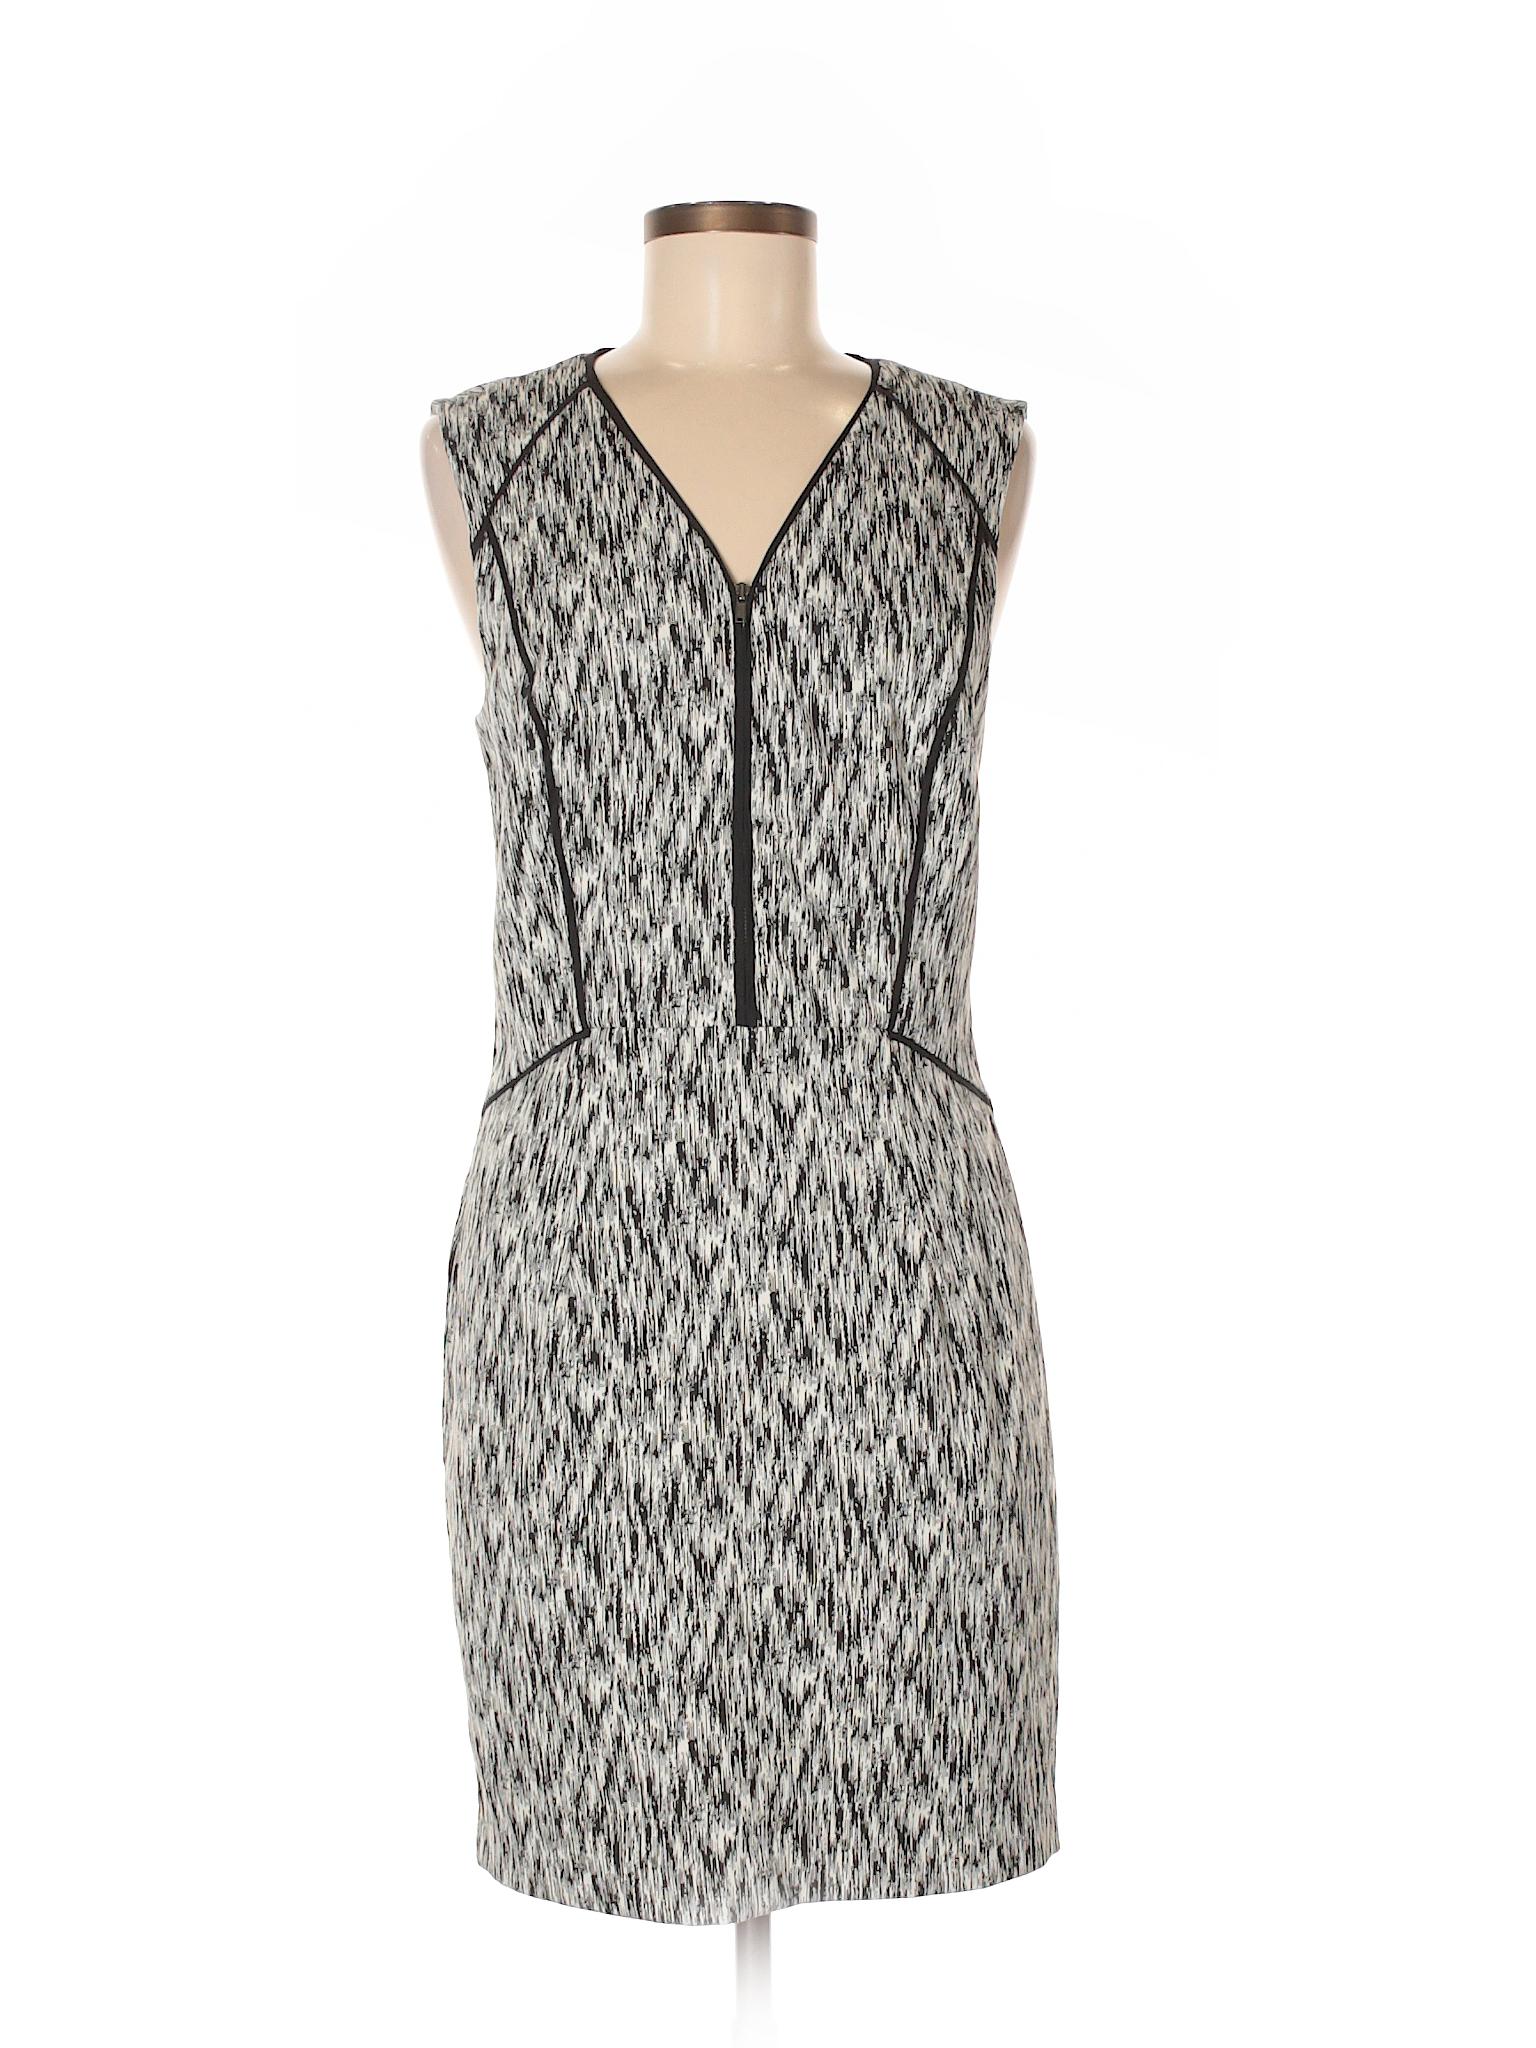 winter Store Casual Factory Dress Boutique Republic Banana PnFdcdSq1